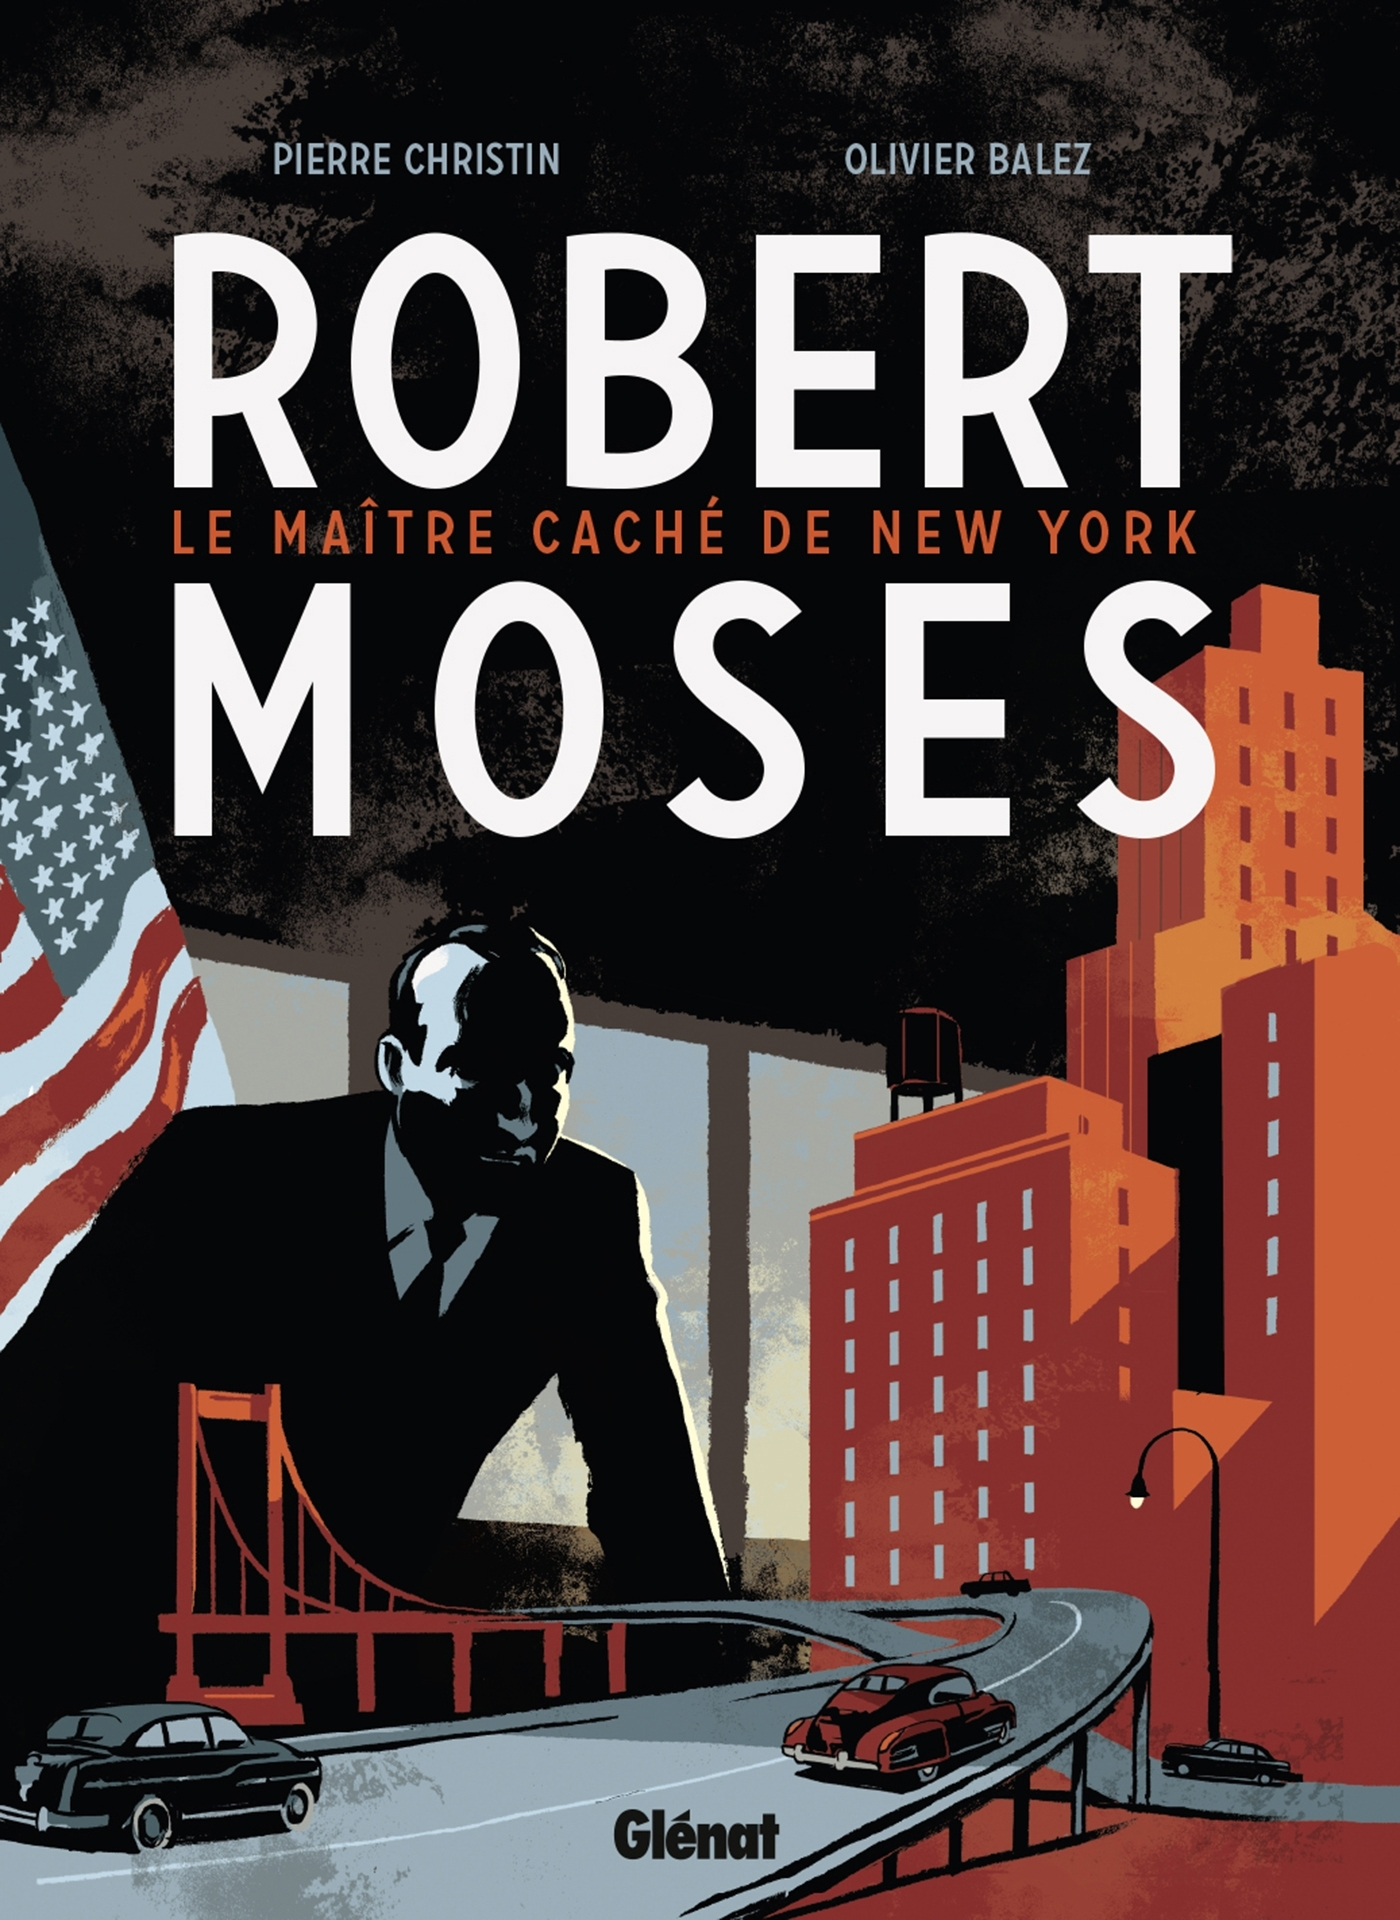 ROBERT MOSES - LE MAITRE CACHE DE NEW YORK